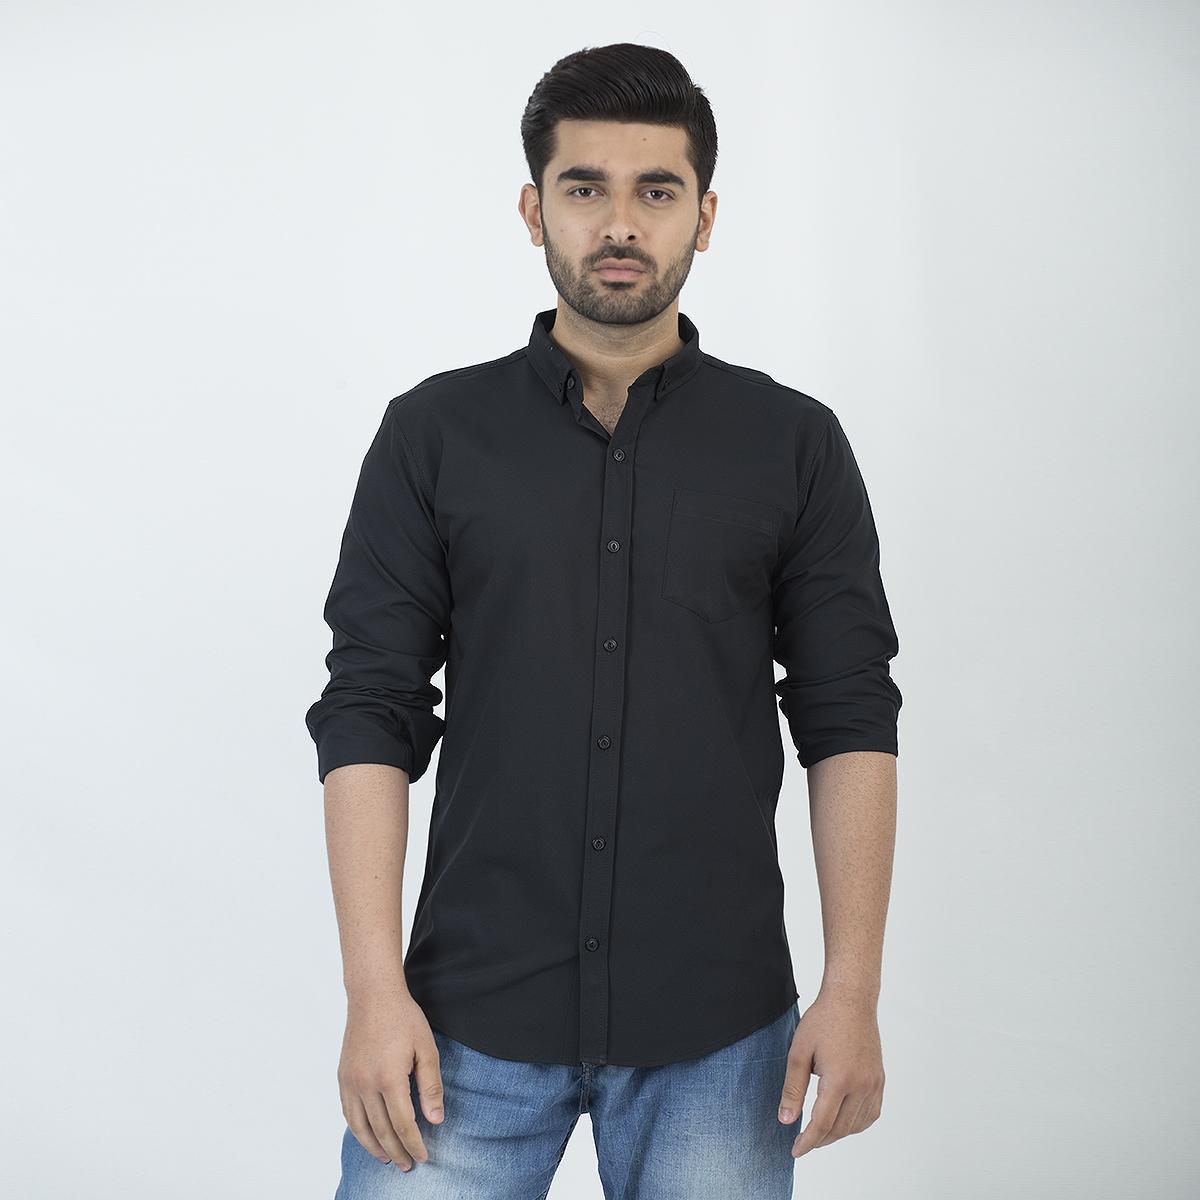 b921d8e19e05 WOLF Casual Slim Fit Cotton Long Sleeve Shirt For Men Fashion - 81